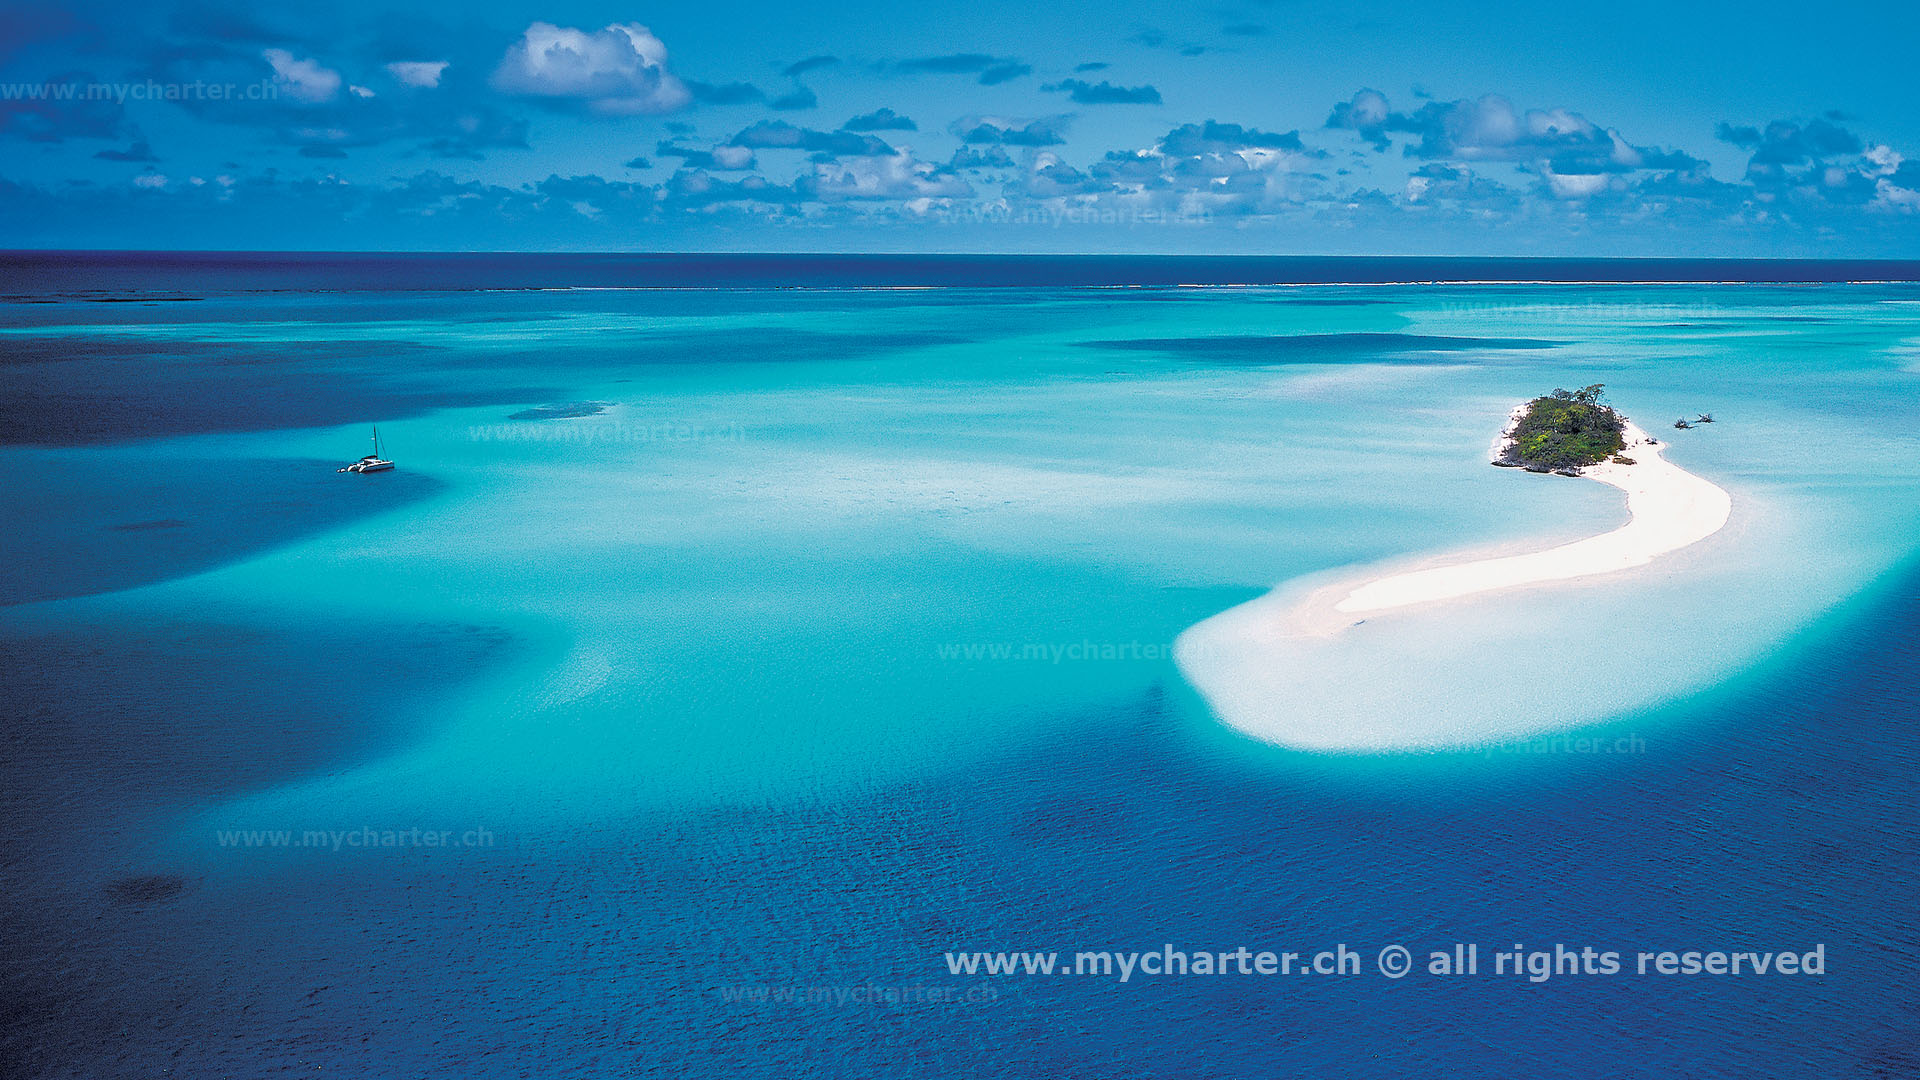 Yachtcharter Neukaledonien - Ile Nakanhoui